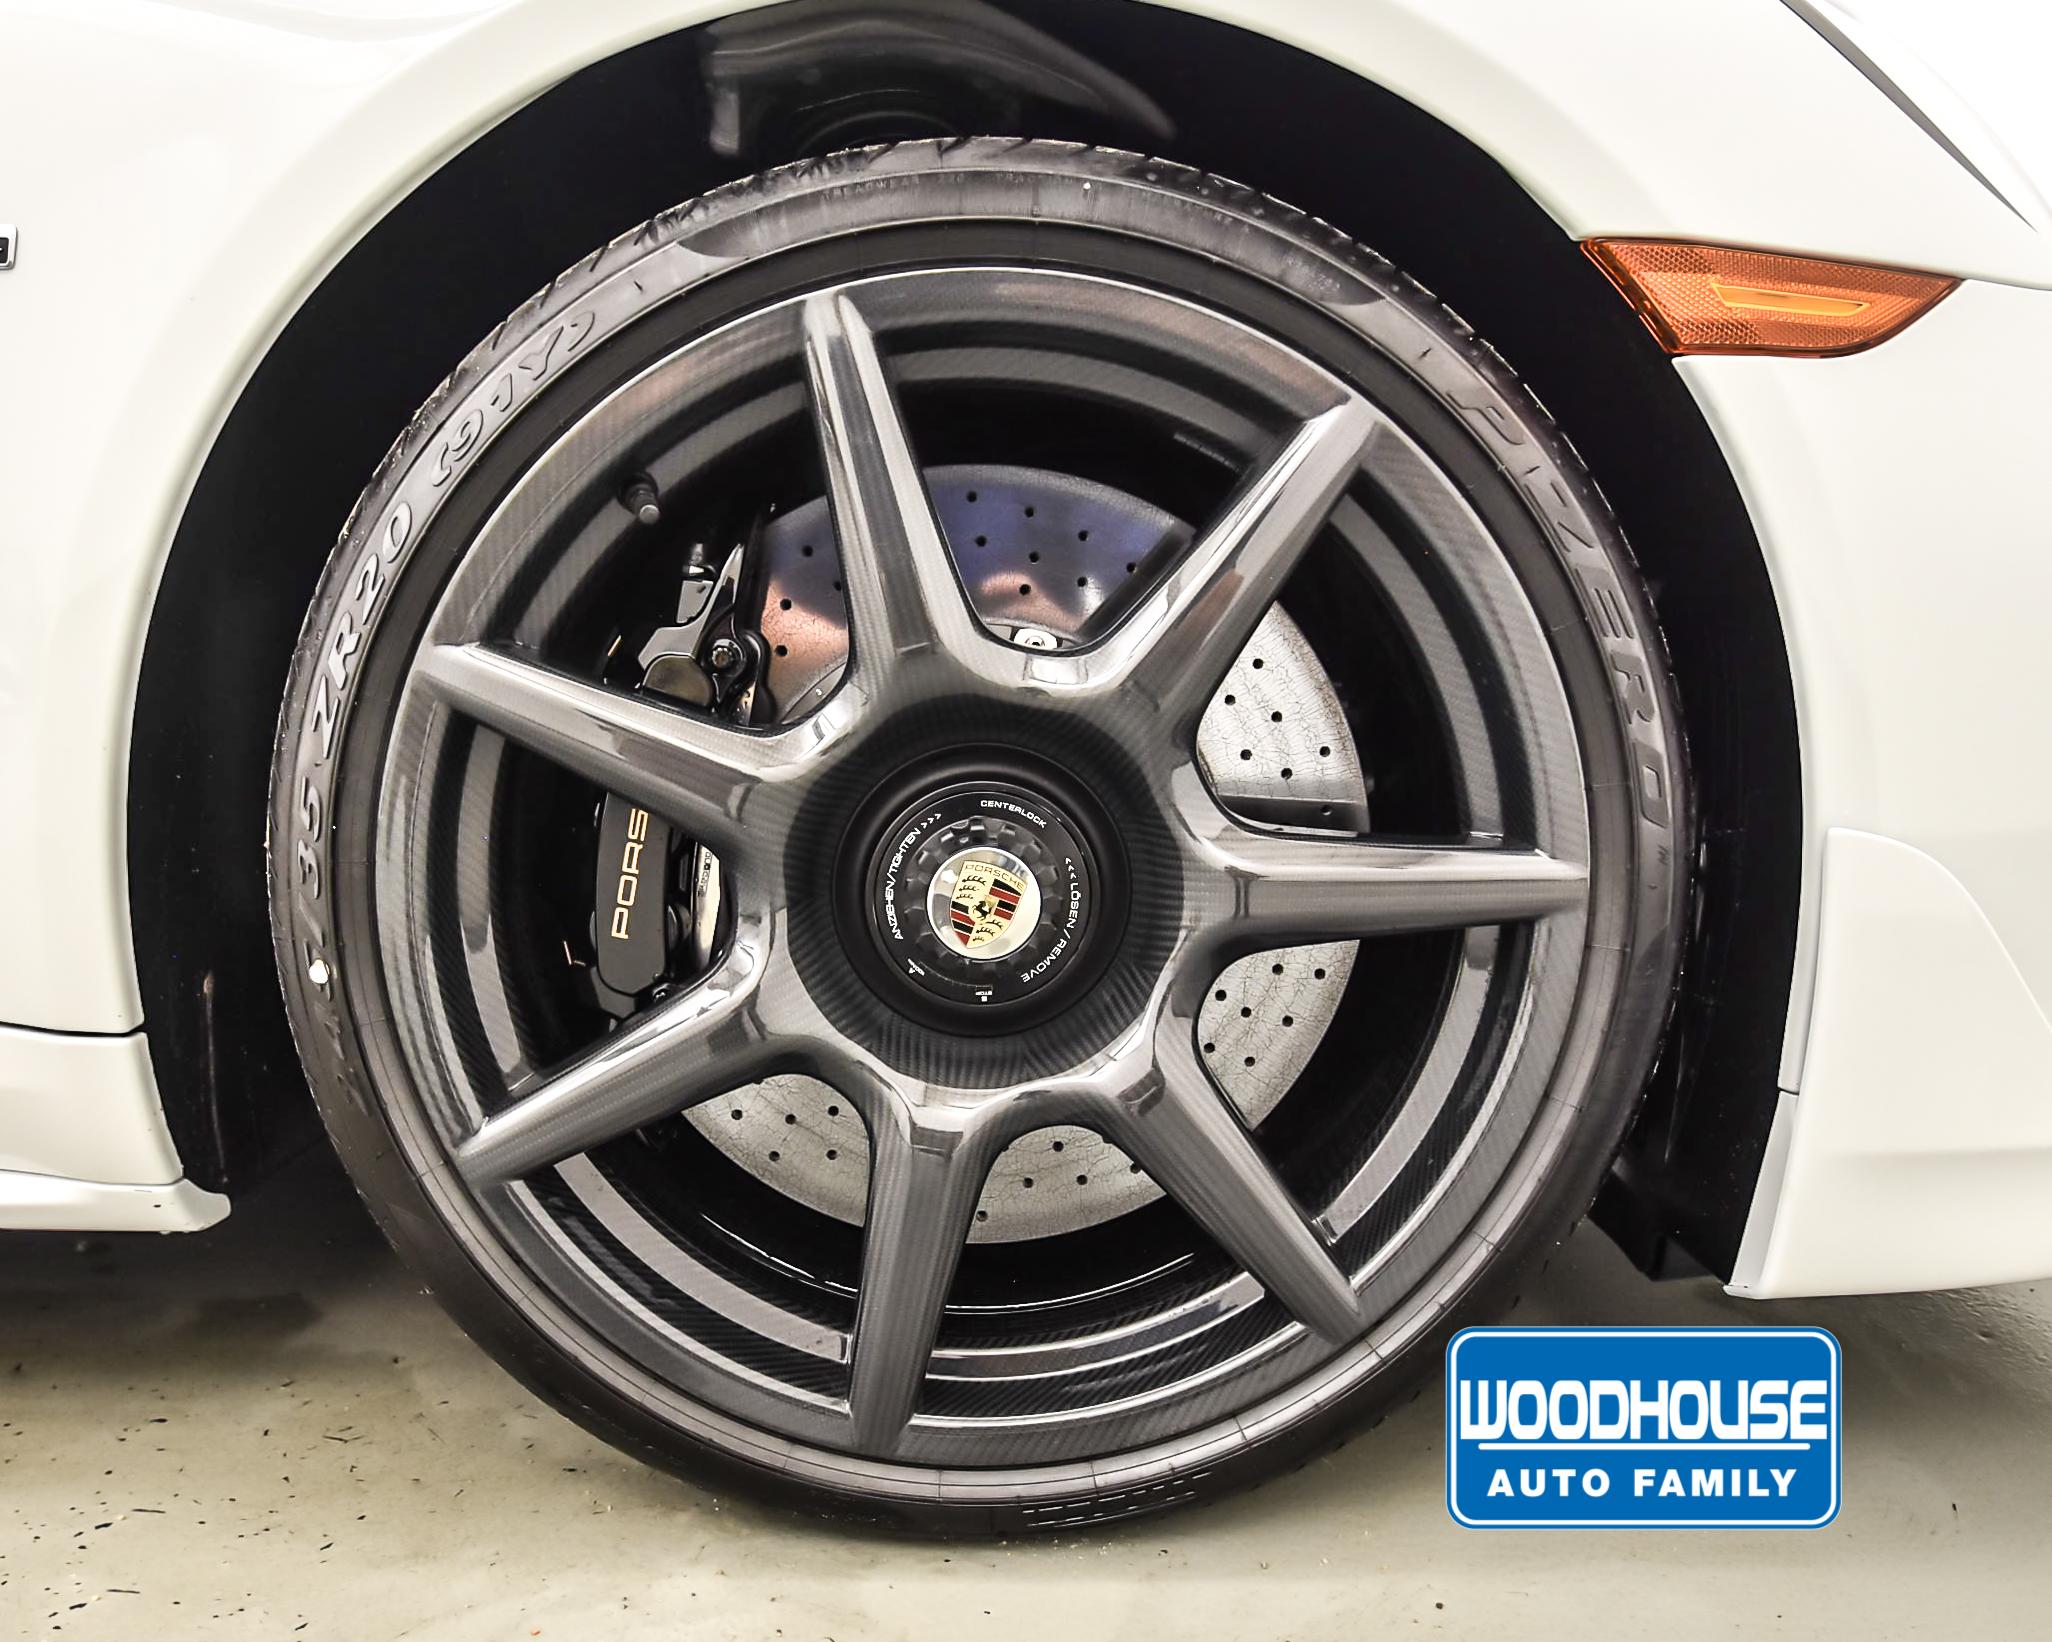 Woodhouse | New 2019 Porsche 911 Turbo For Sale | Porsche